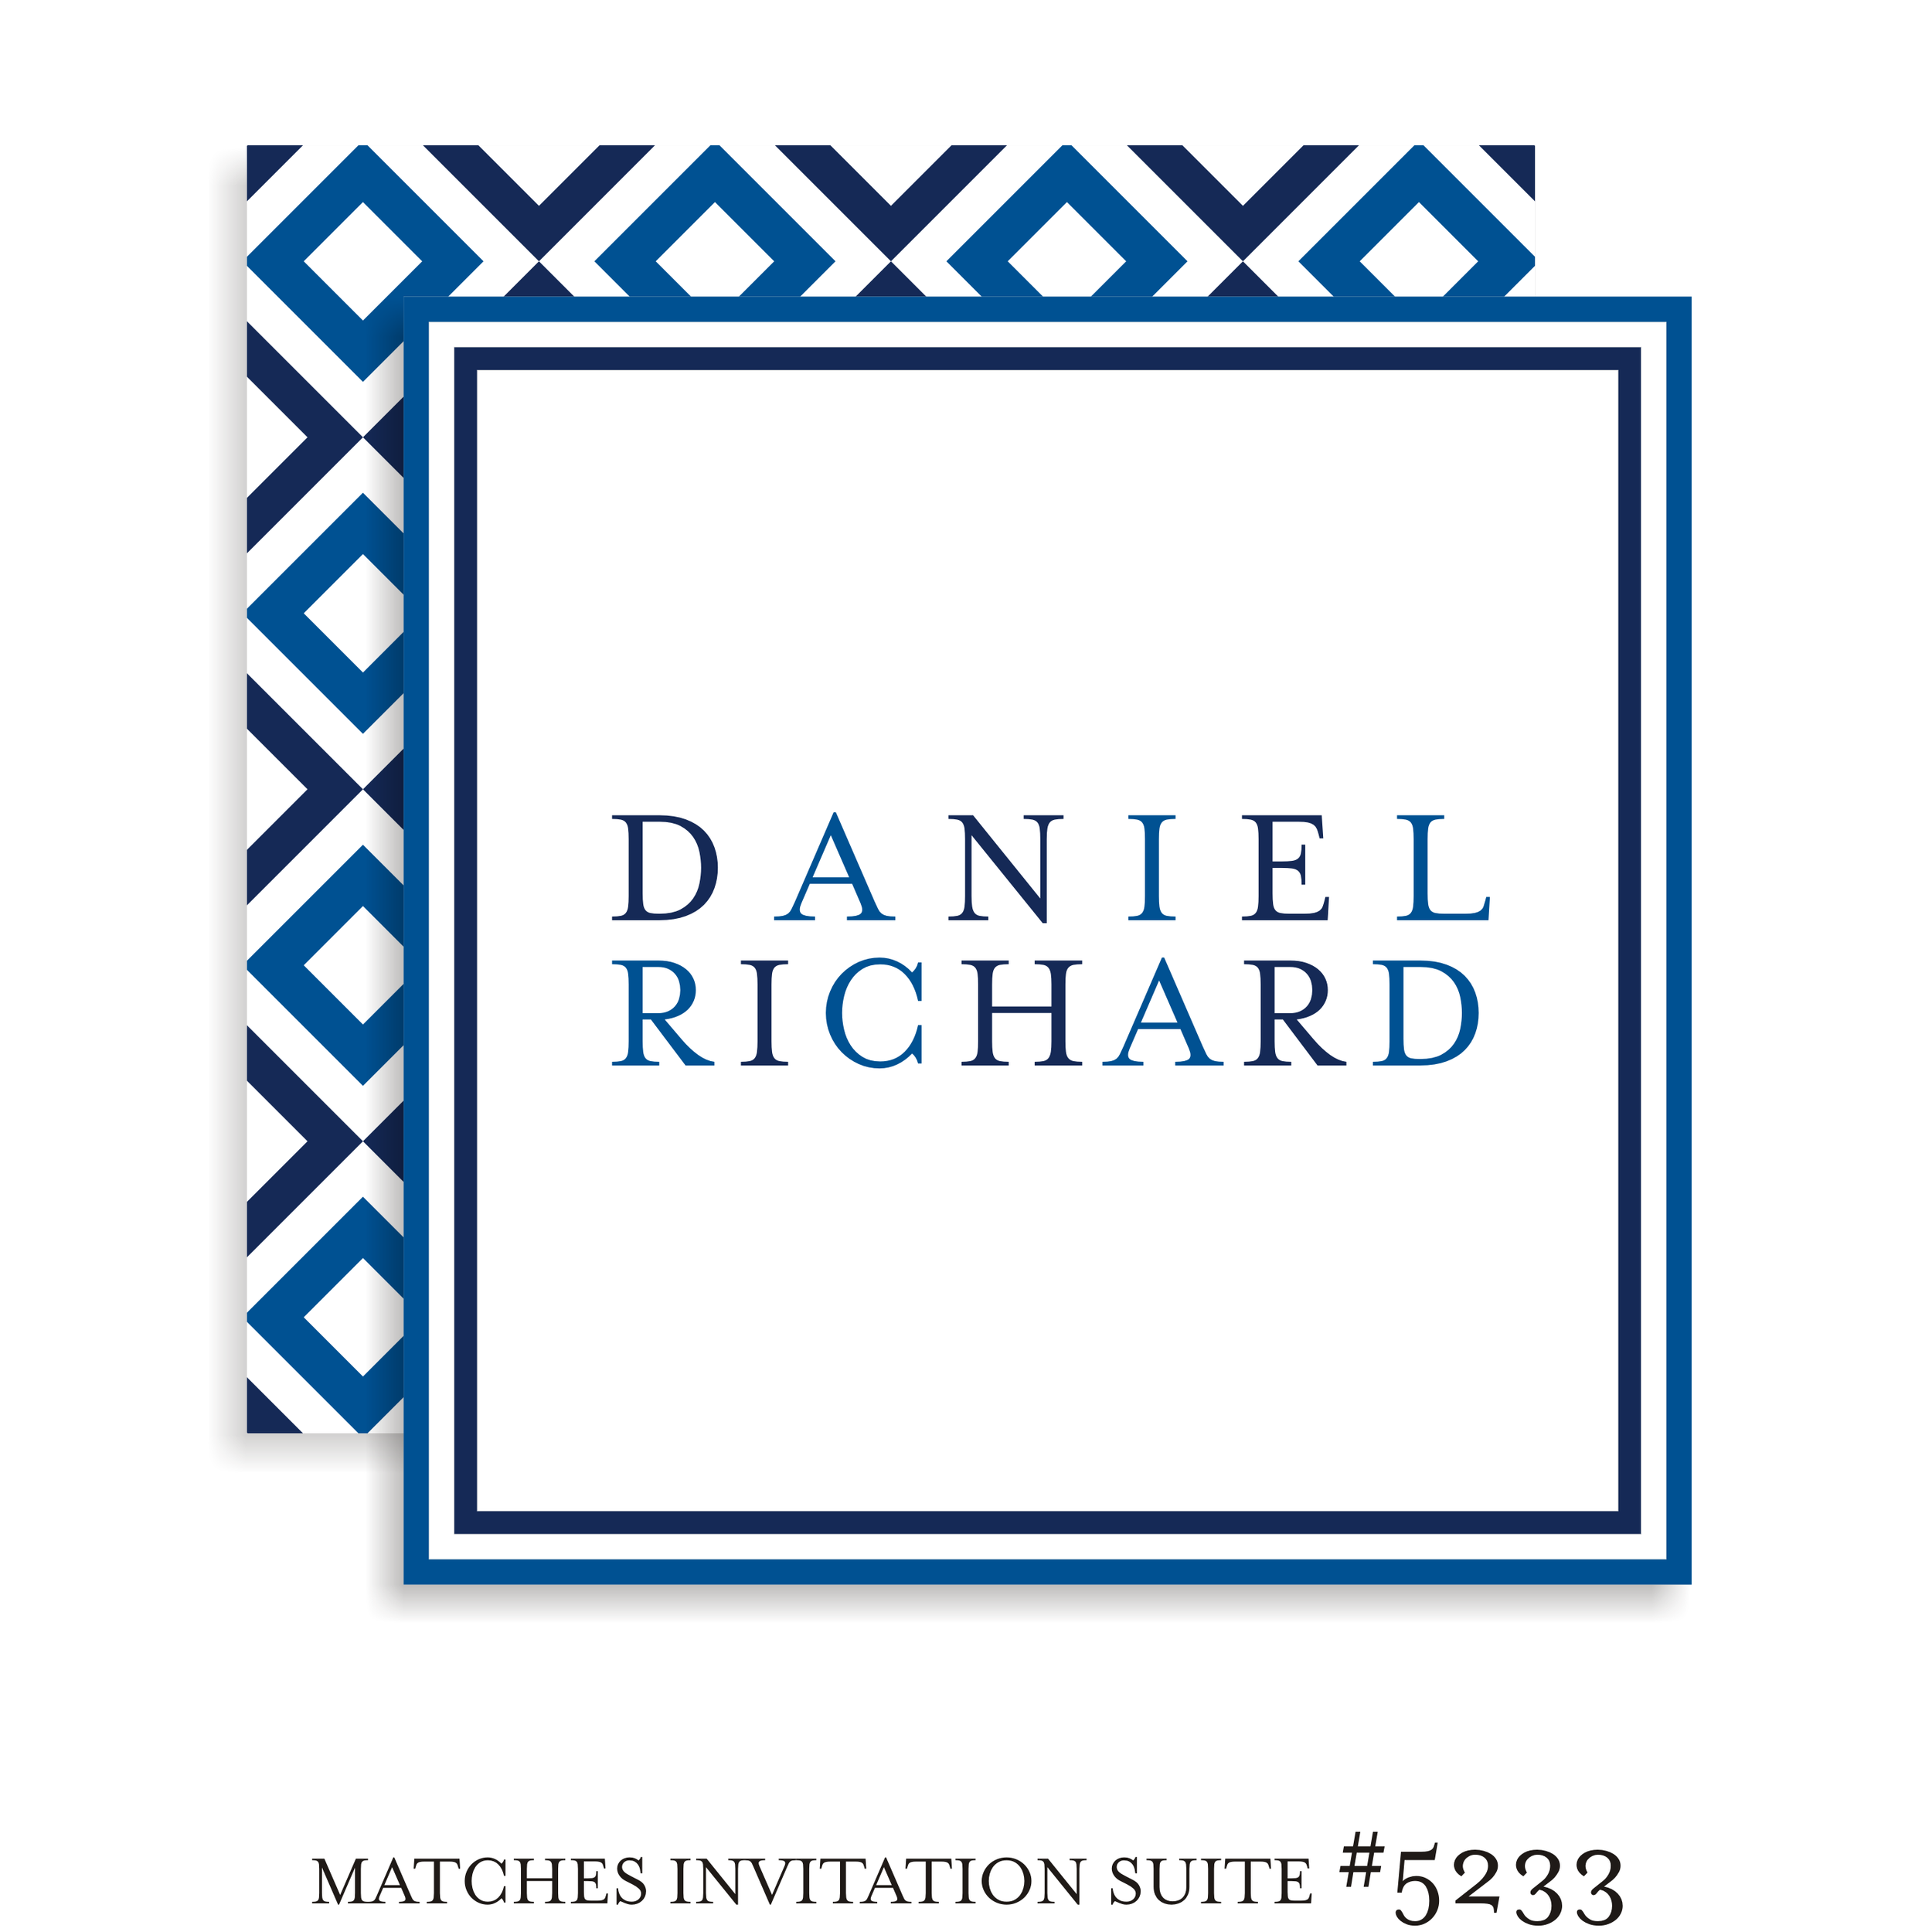 Sign In Board Bar Mitzvah Suite 5233 - Daniel Richard